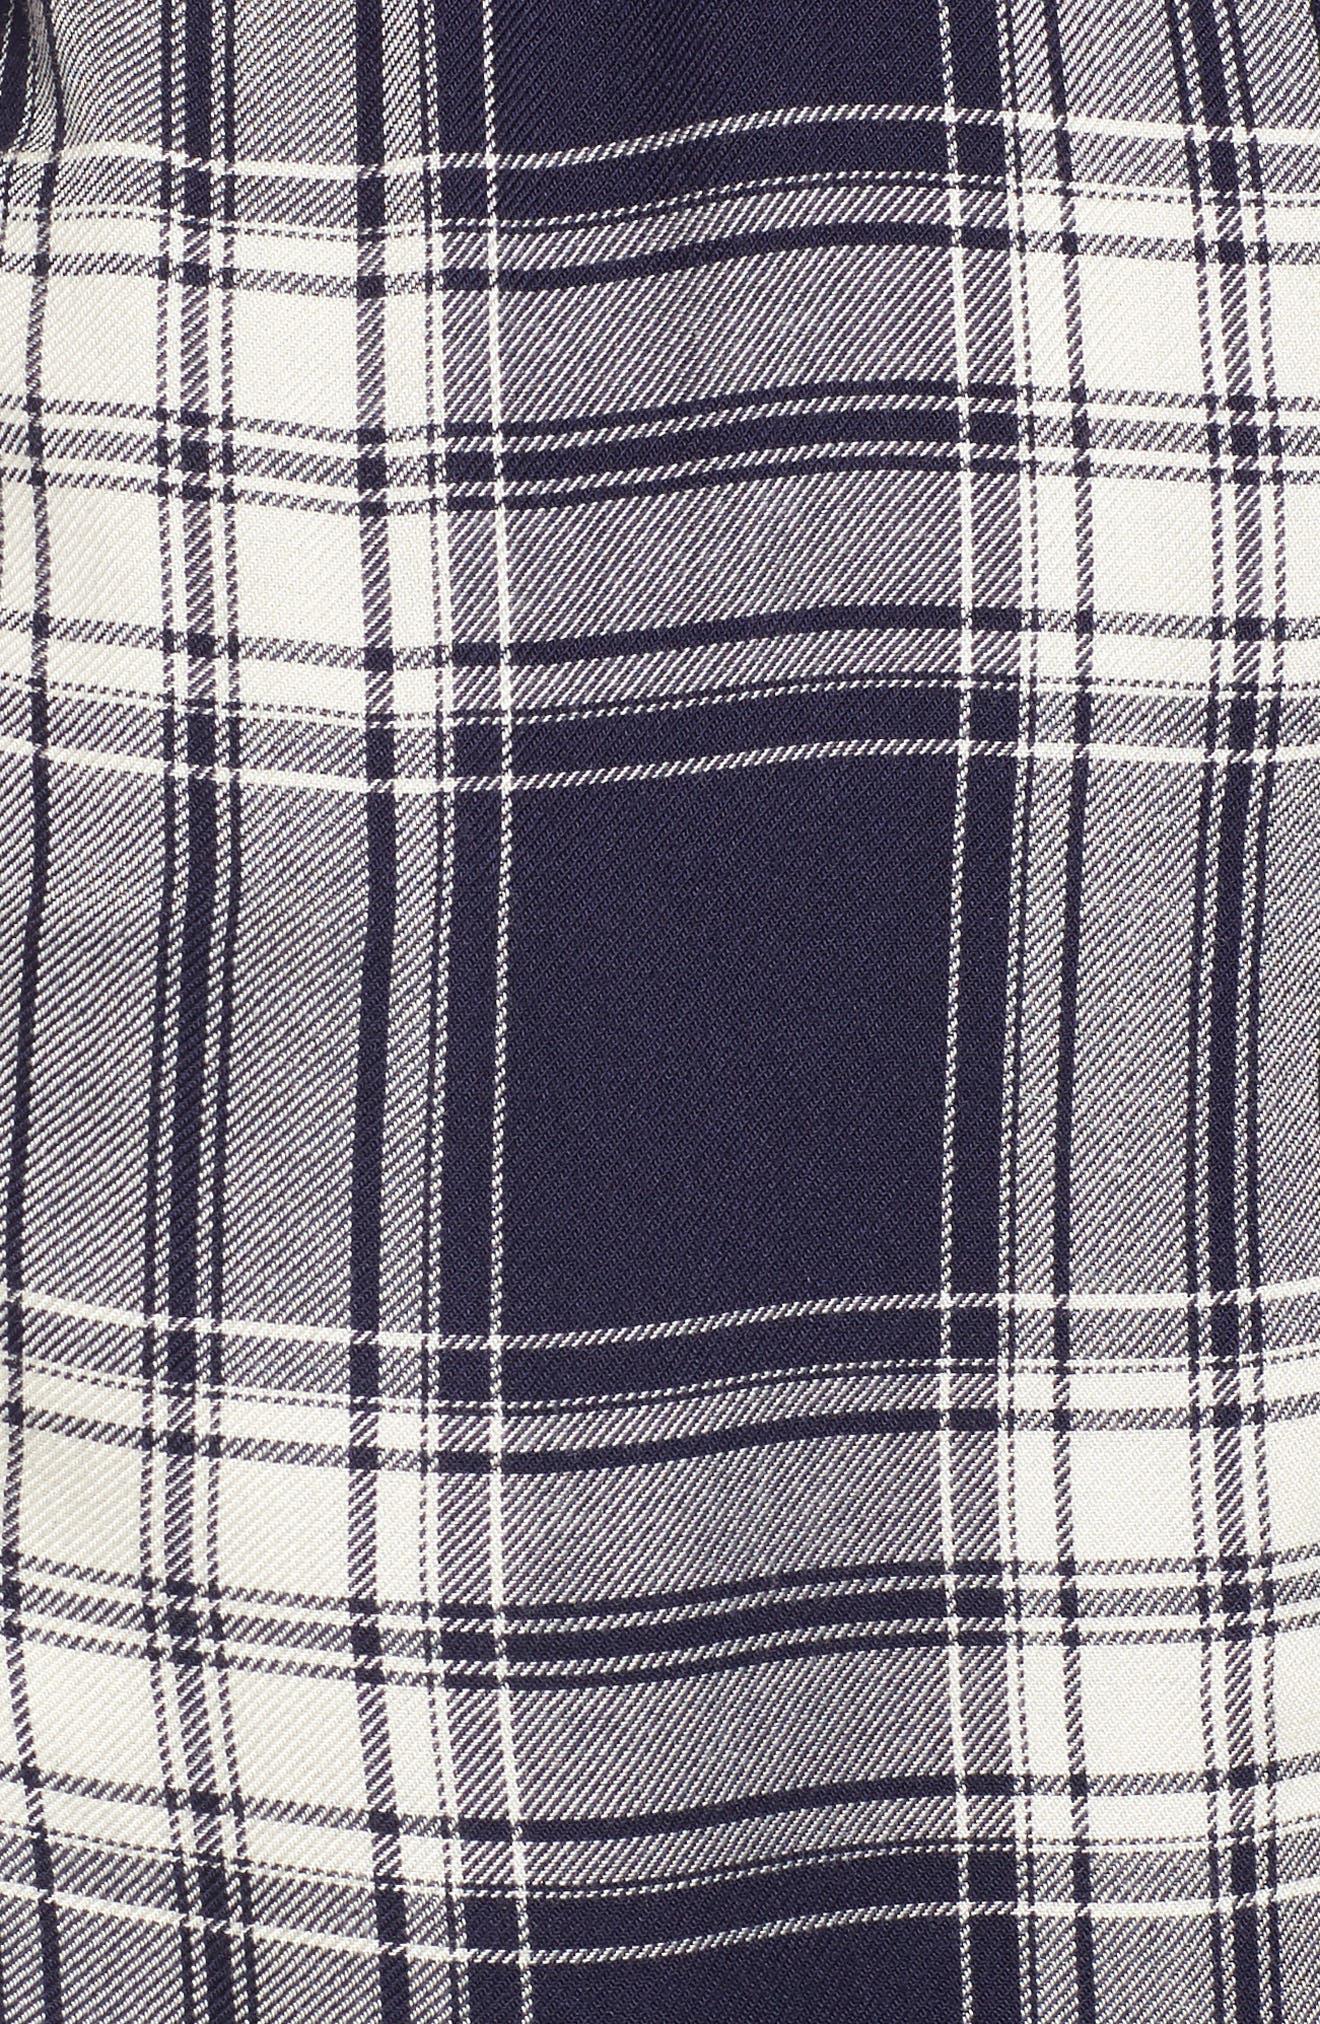 Oversize Flannel Shirt,                             Alternate thumbnail 5, color,                             Navy Peacoat Rose Plaid